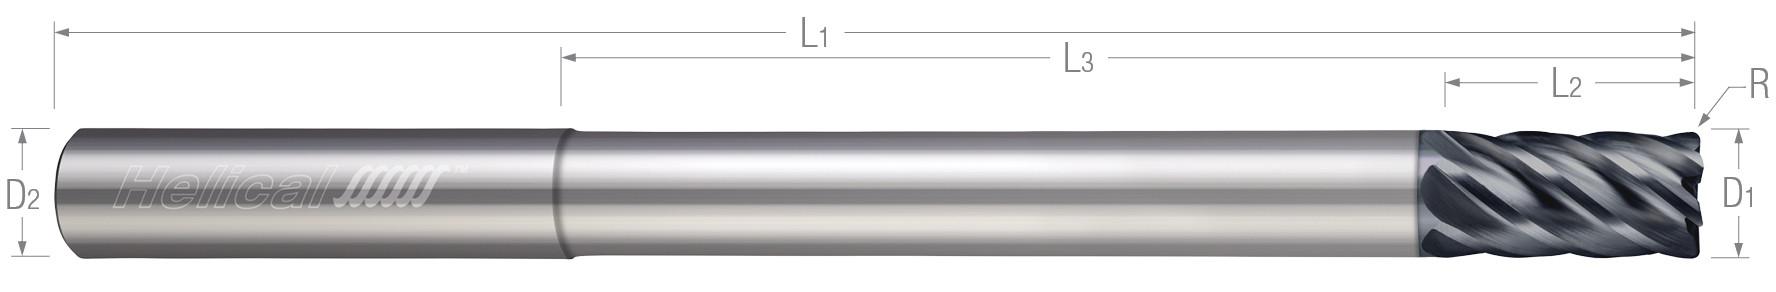 6 Flute - Corner Radius - Variable Pitch - Reduced Neck